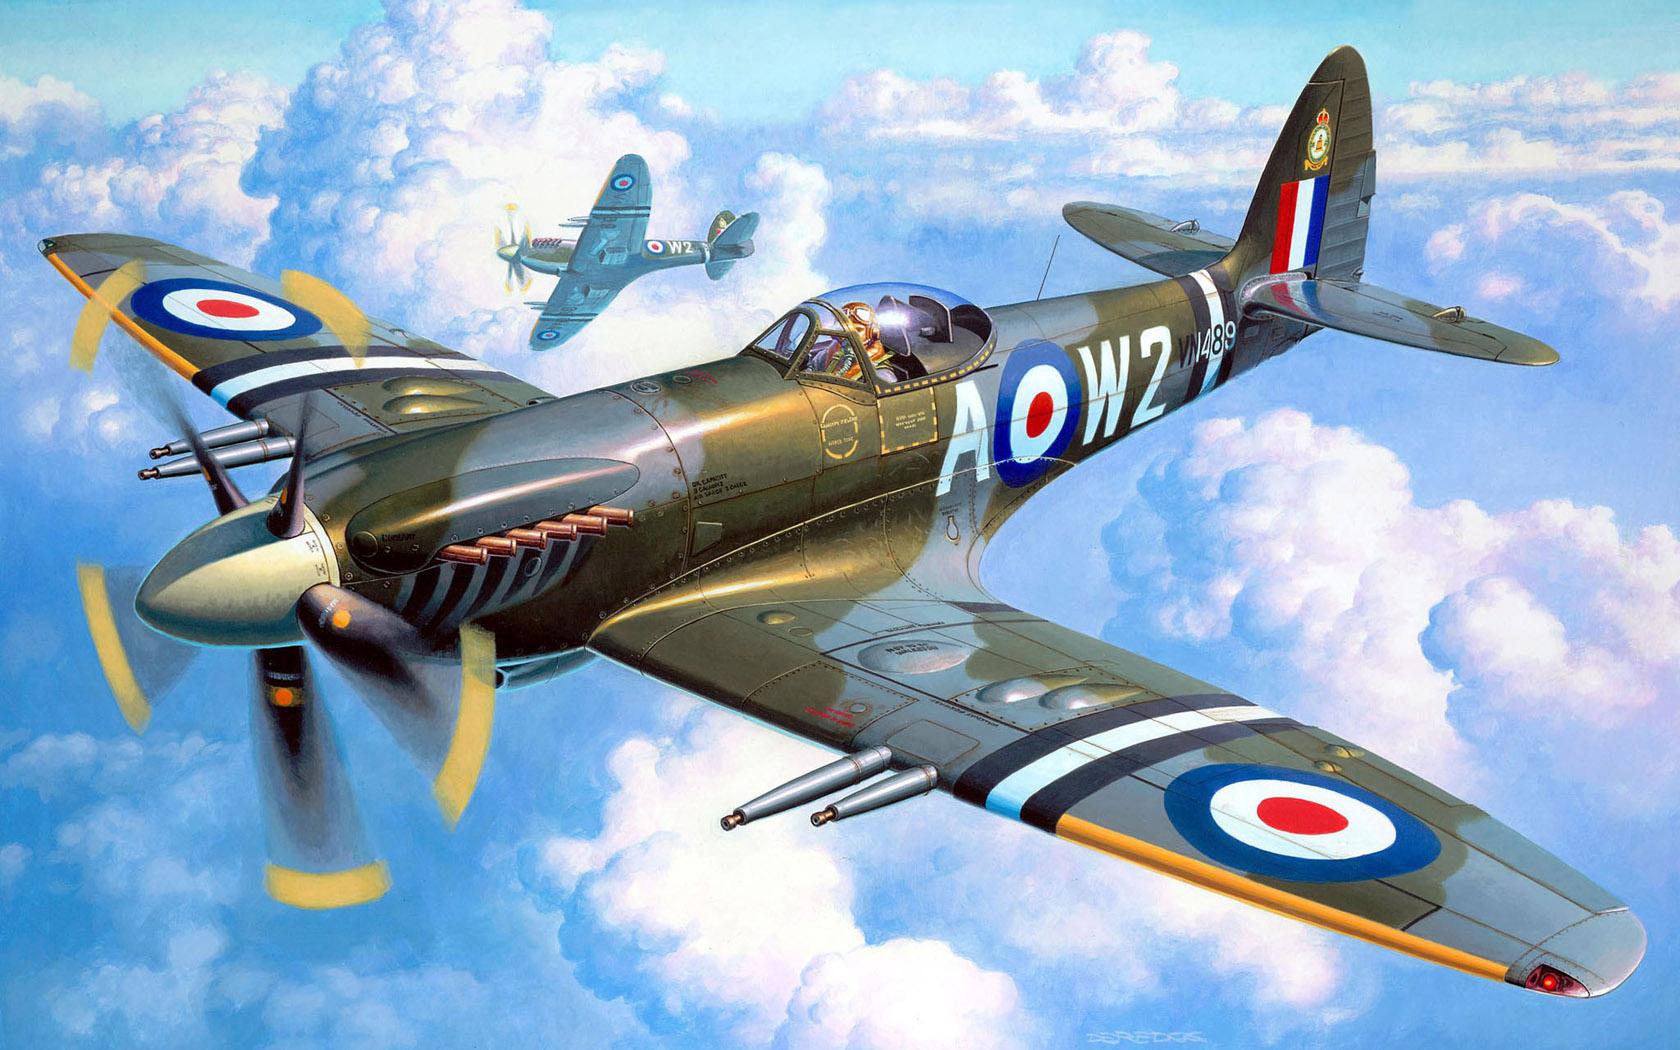 Deredos Andrzej. Истребитель Supermarine Spitfire Mk.22.